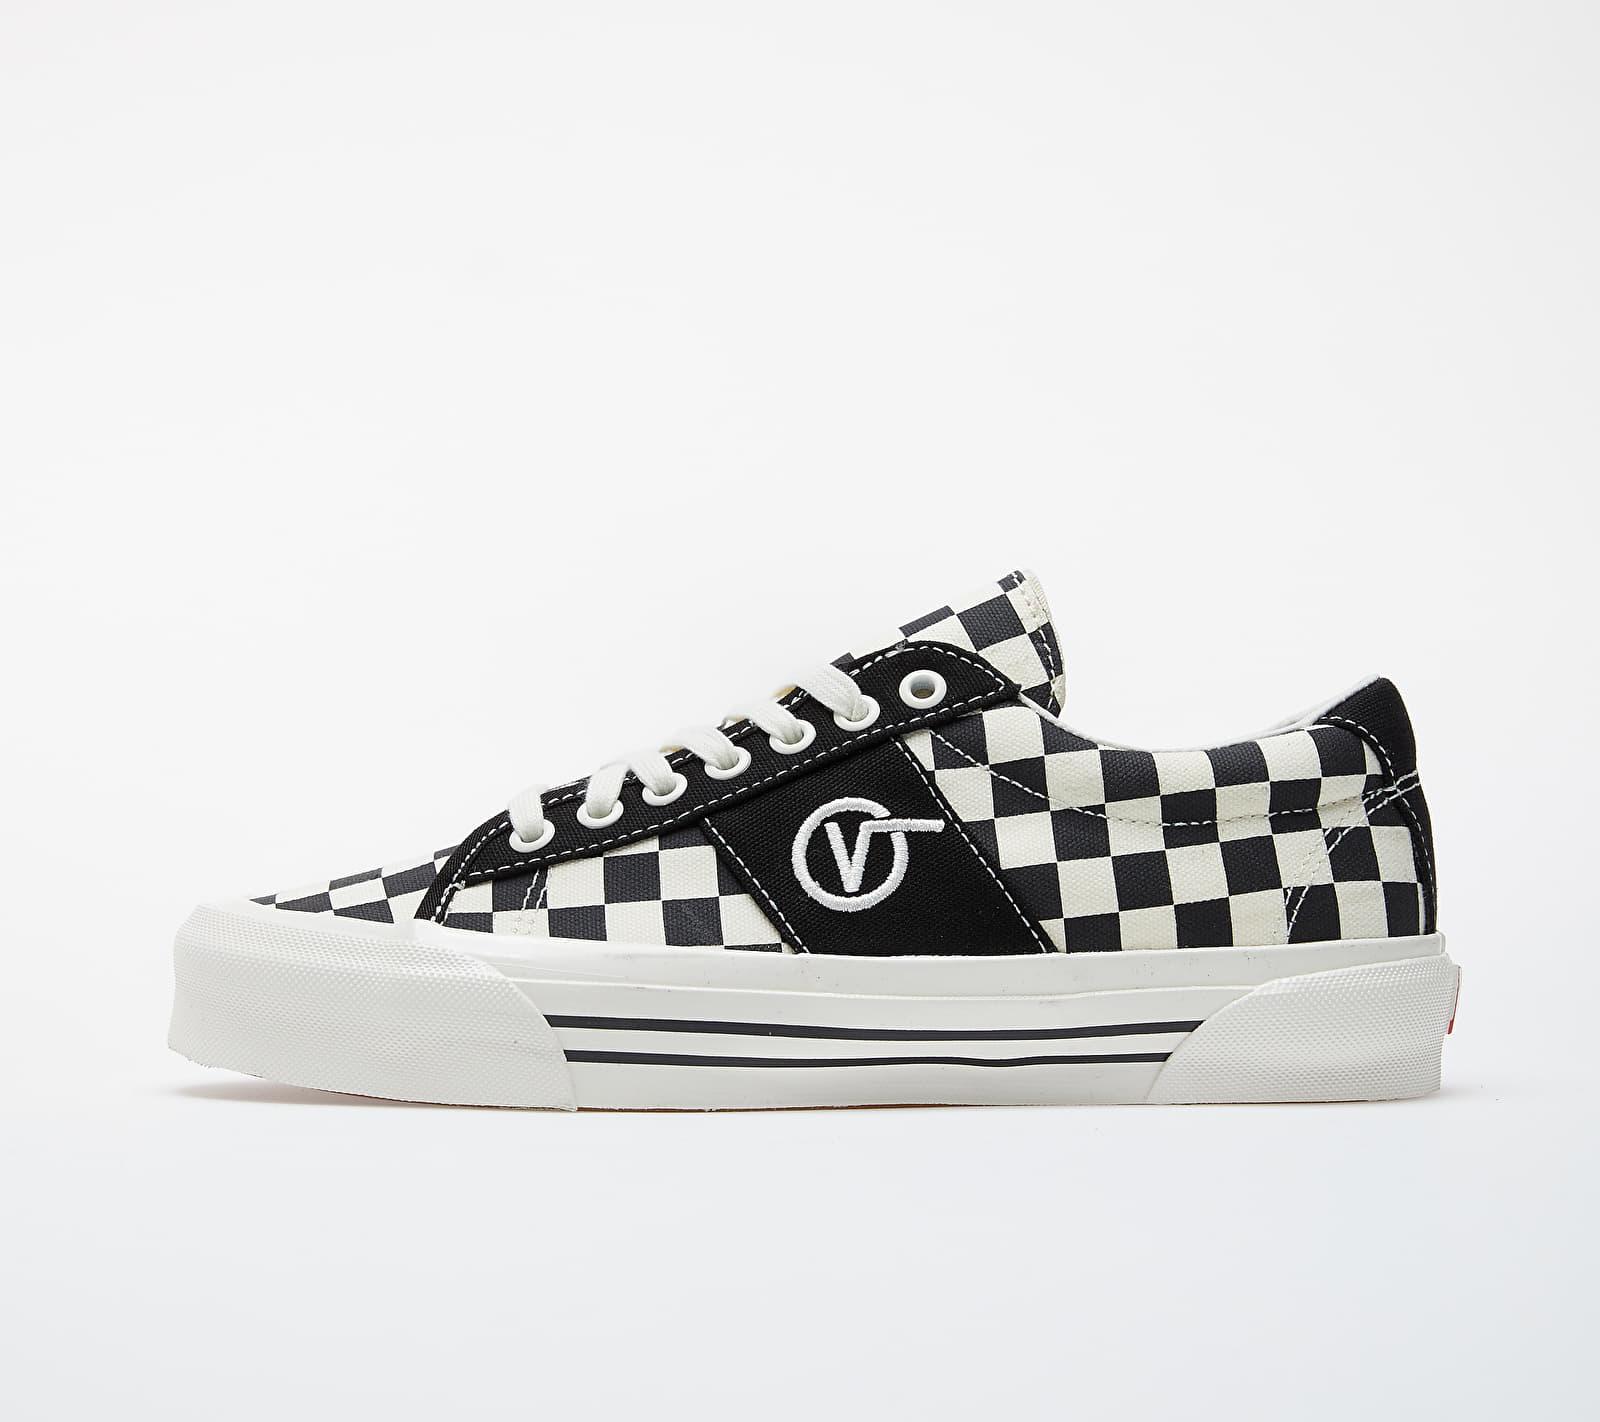 Vans OG Sid LX (Canvas/ Checkerboard) Black/ White VN0A4U13XC81